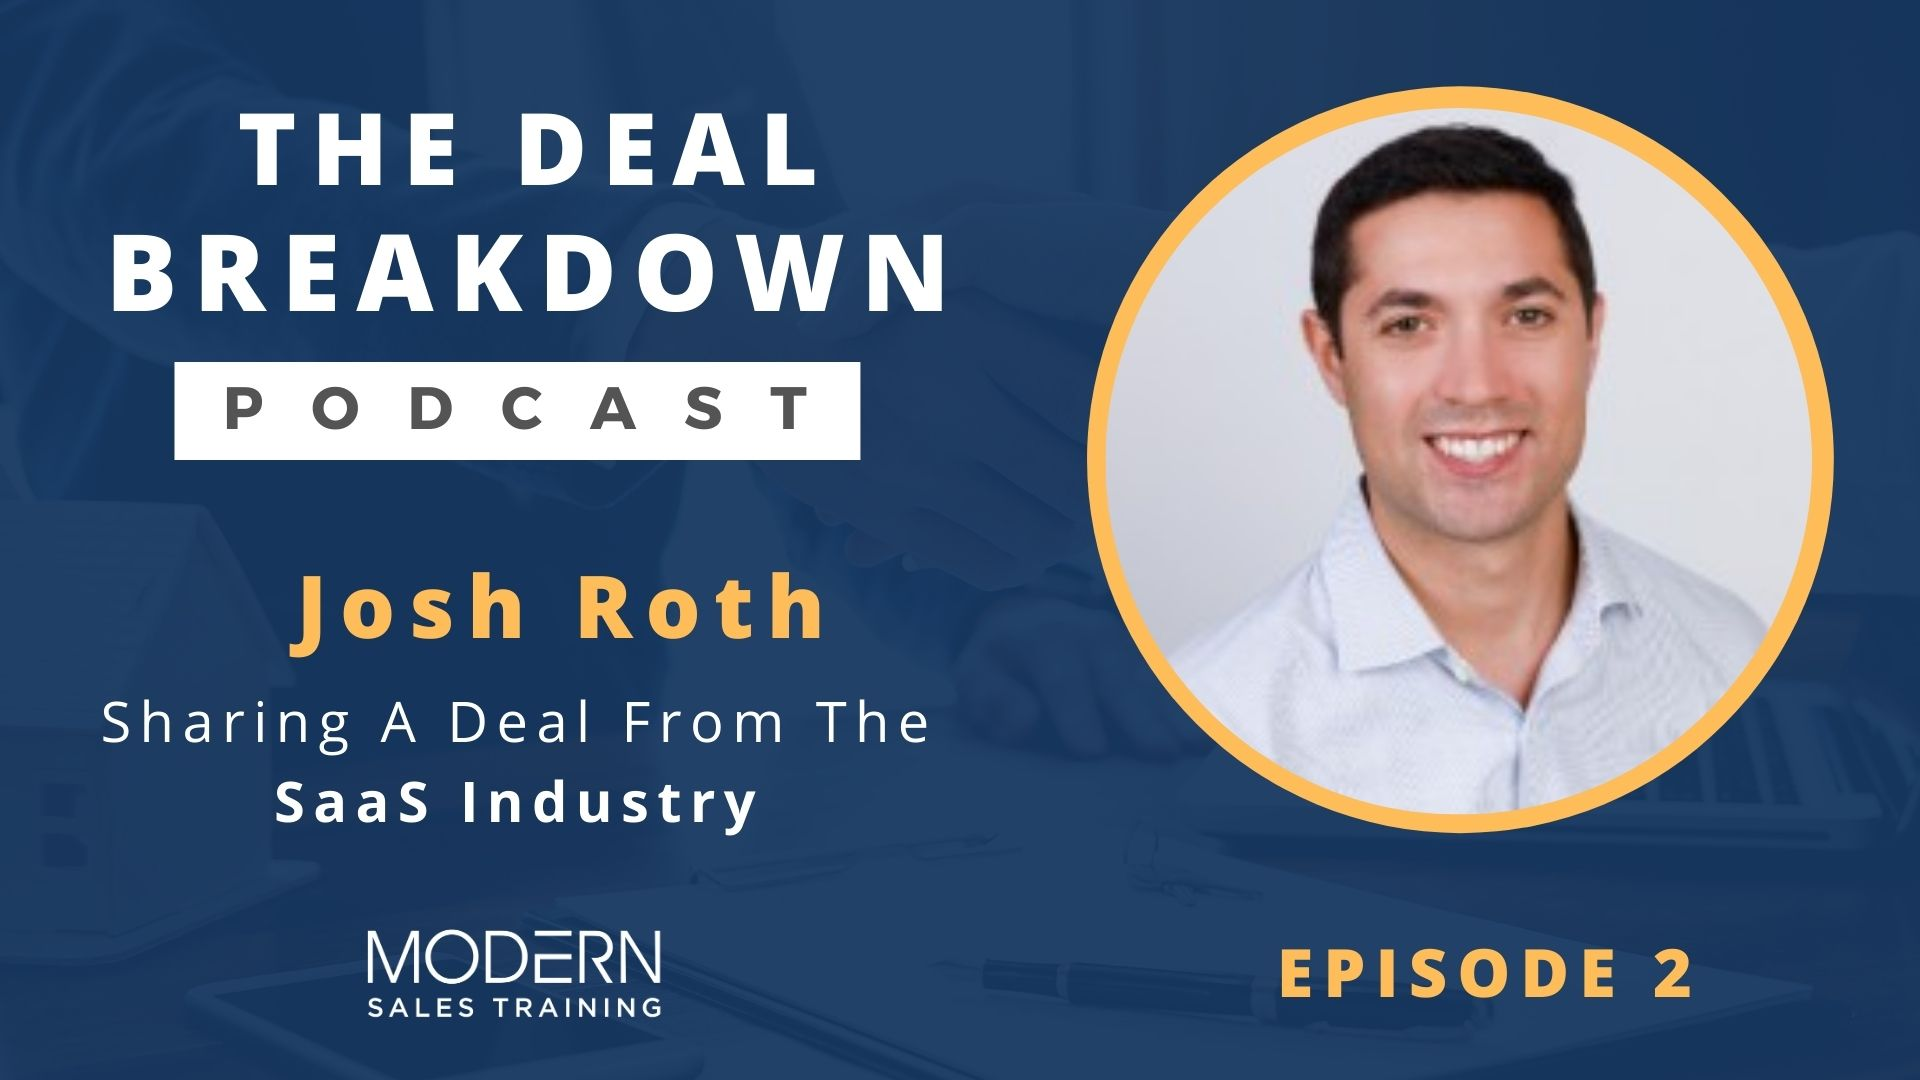 The-Deal-Breakdown-Podcast-Modern-Sales-Training-Josh-Roth